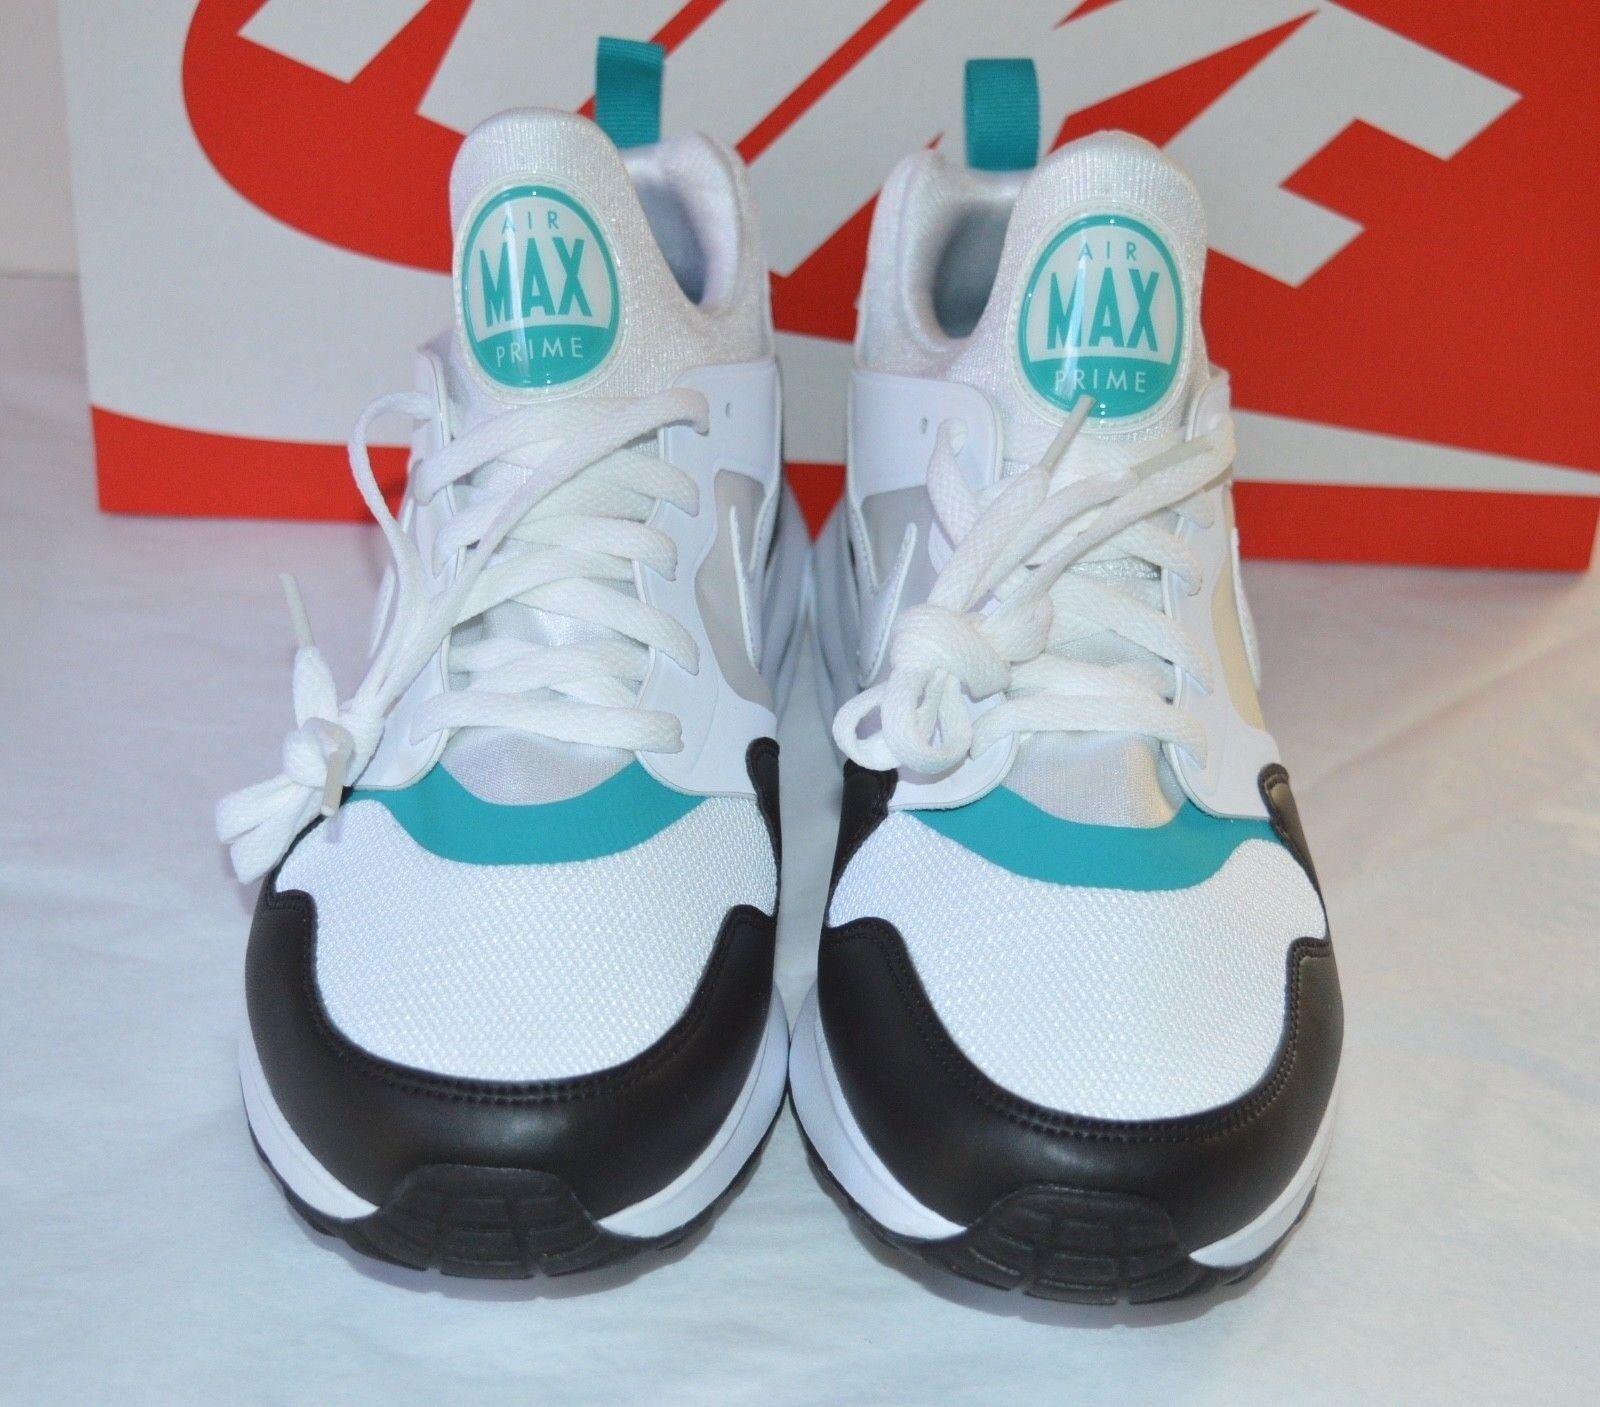 New DS Nike Air Max Prime White/Turbo Green/Black Retro Rare sz 10